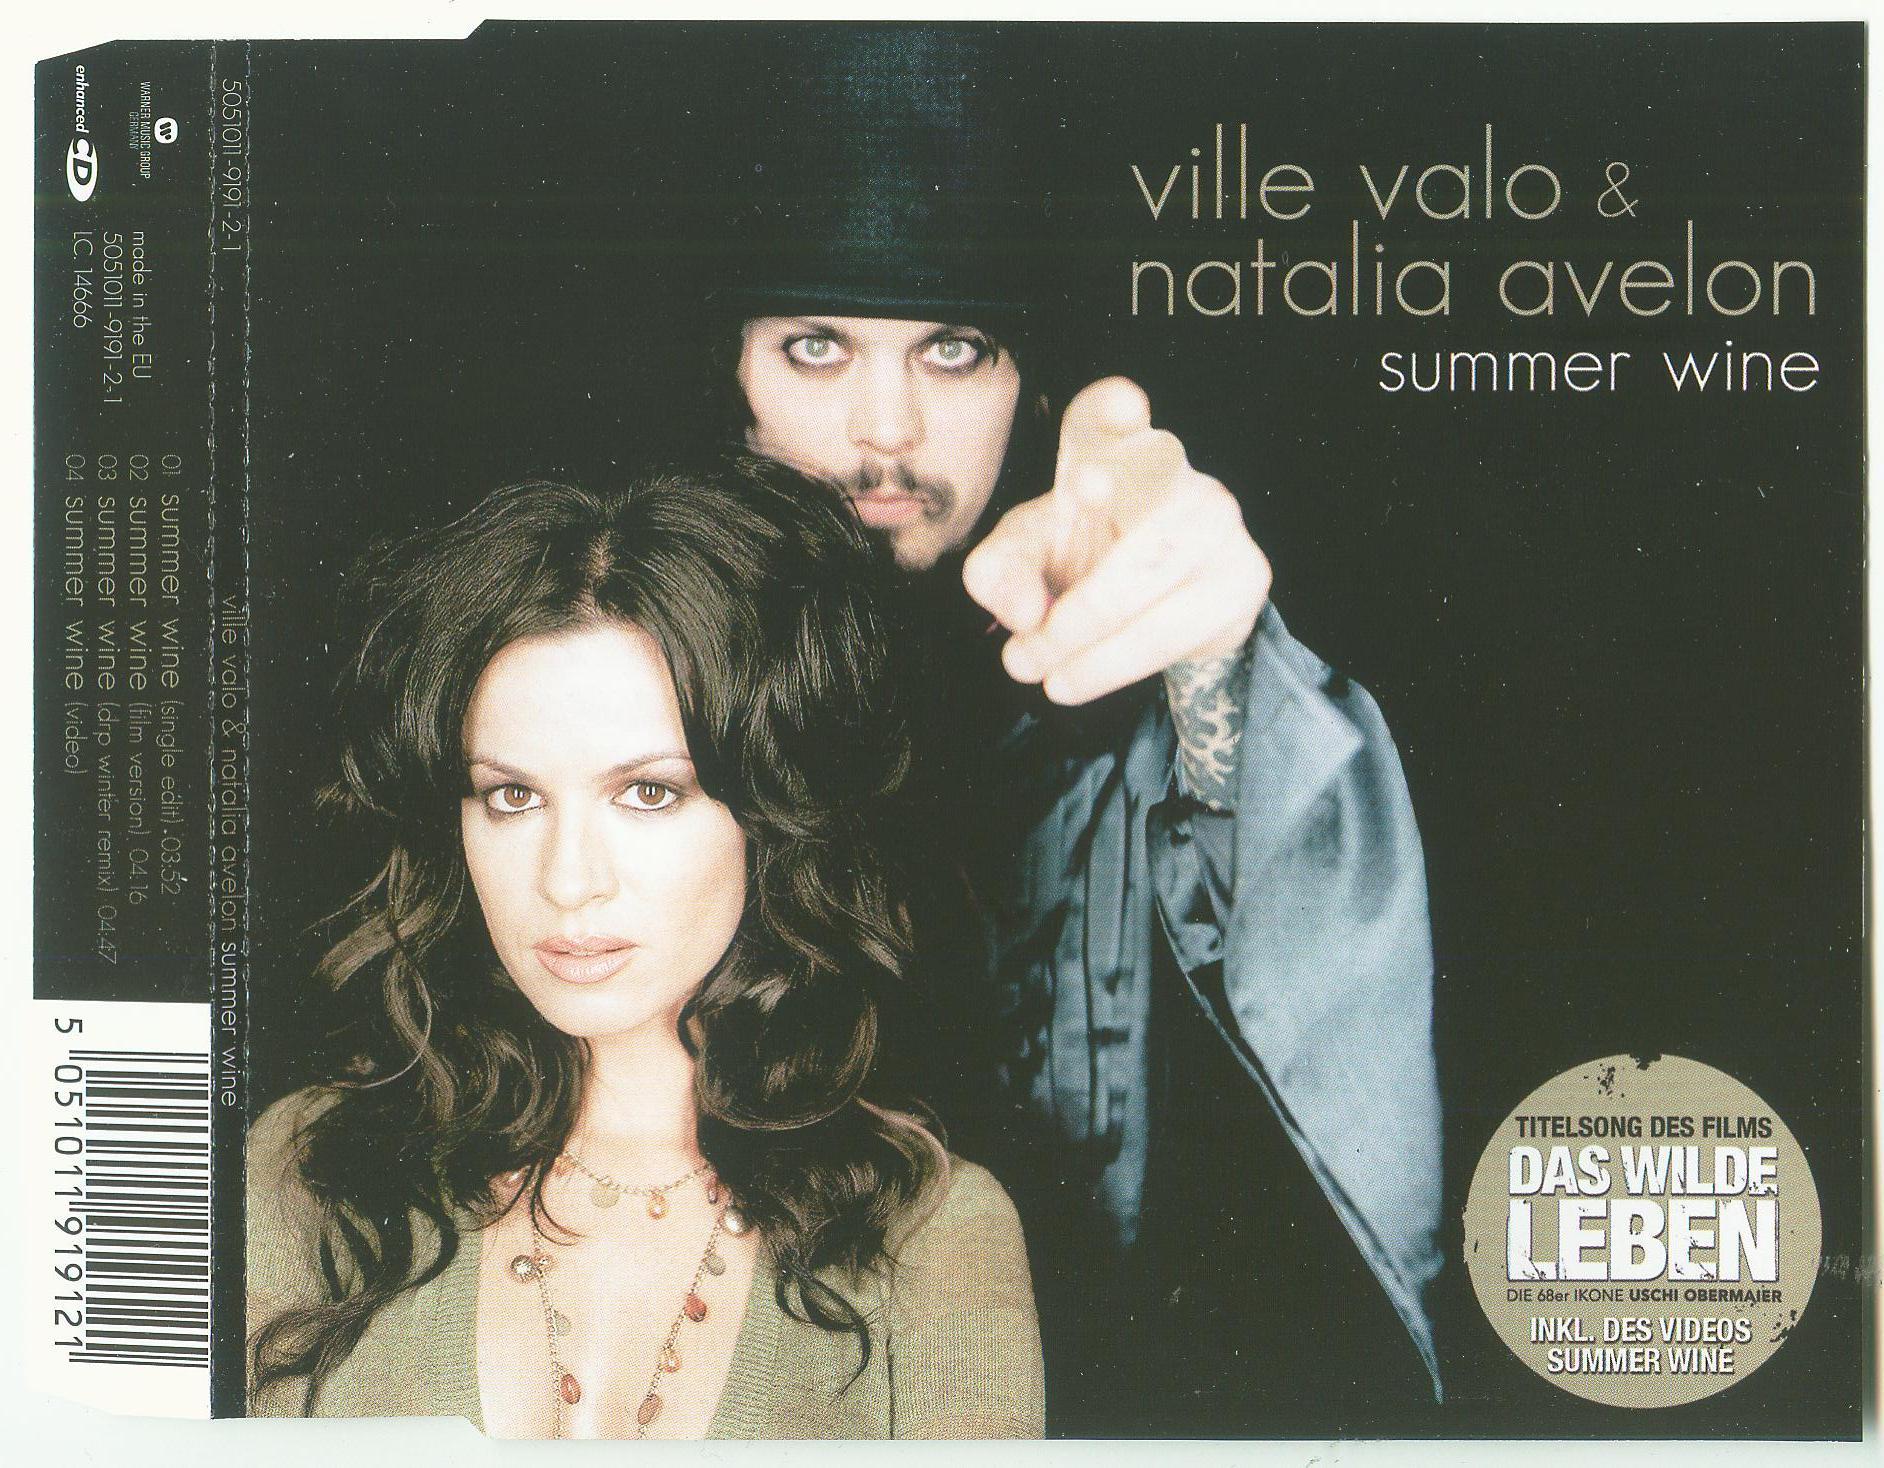 Ville valo feat. Natalia avelon summer wine (george royal.